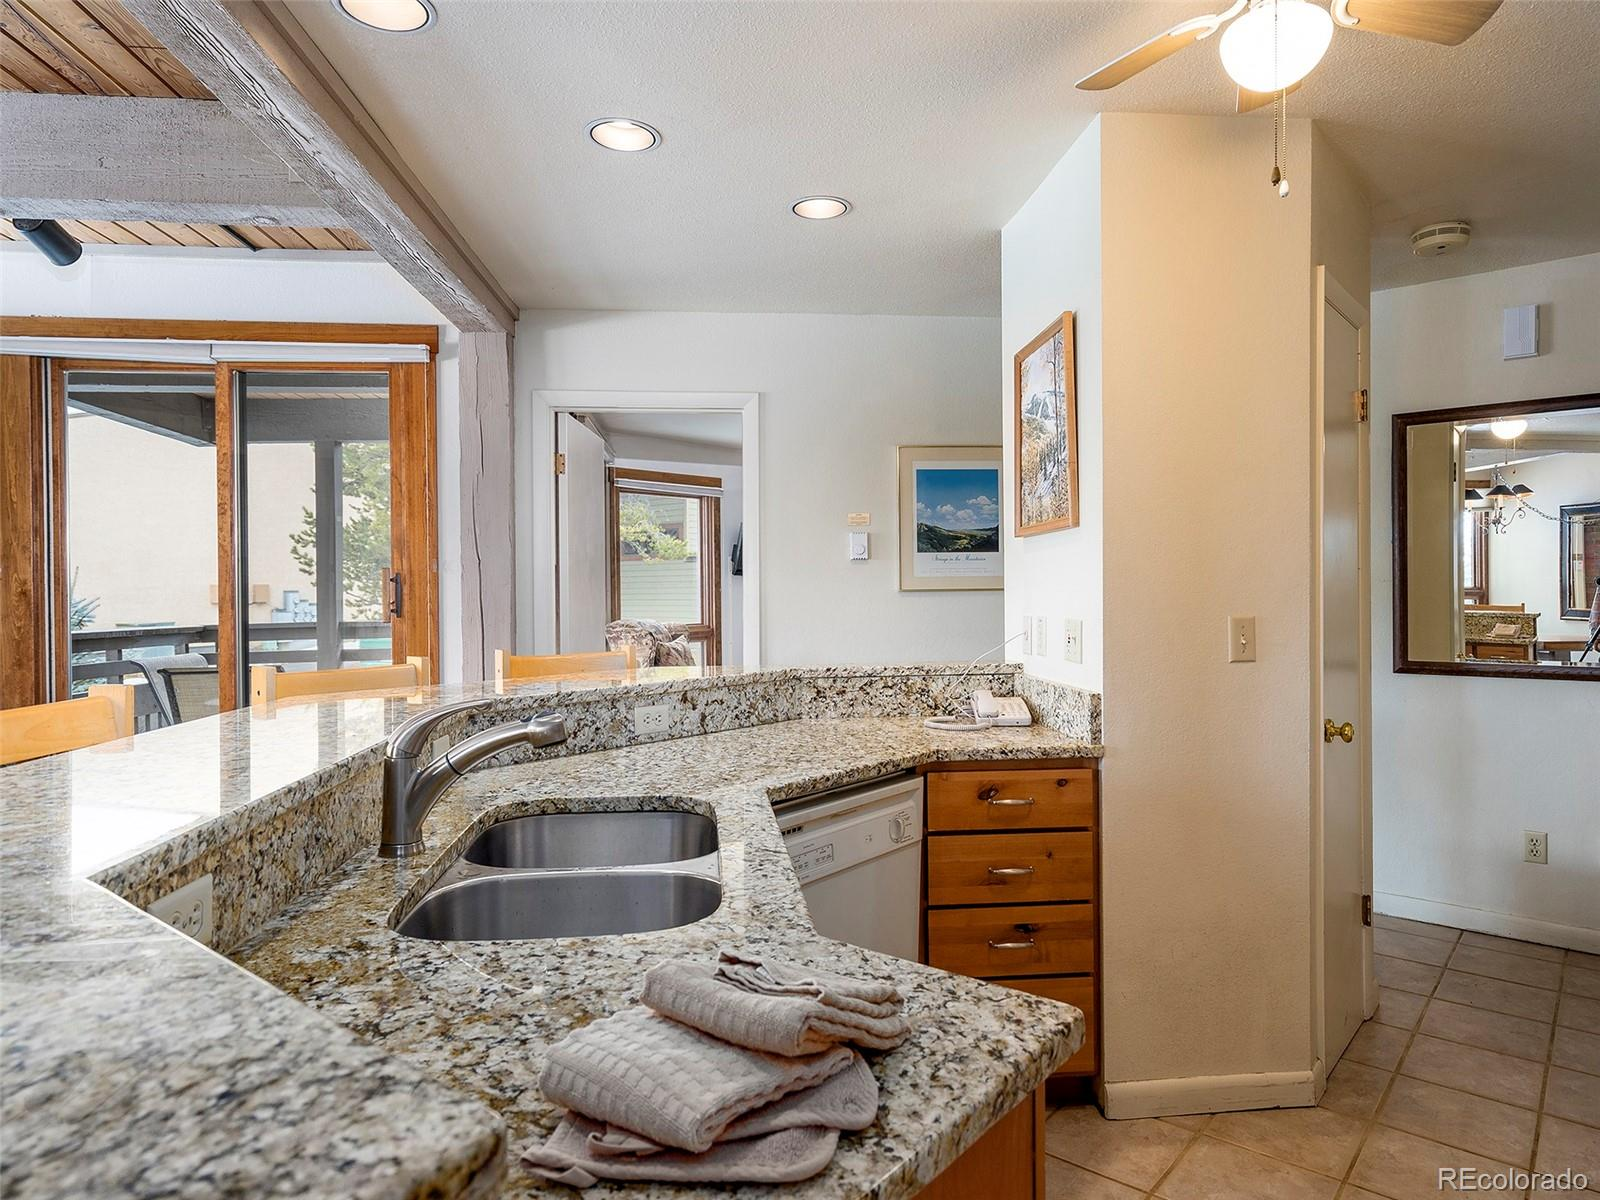 MLS# 4193338 - 6 - 2700 Village Drive #D-204, Steamboat Springs, CO 80487